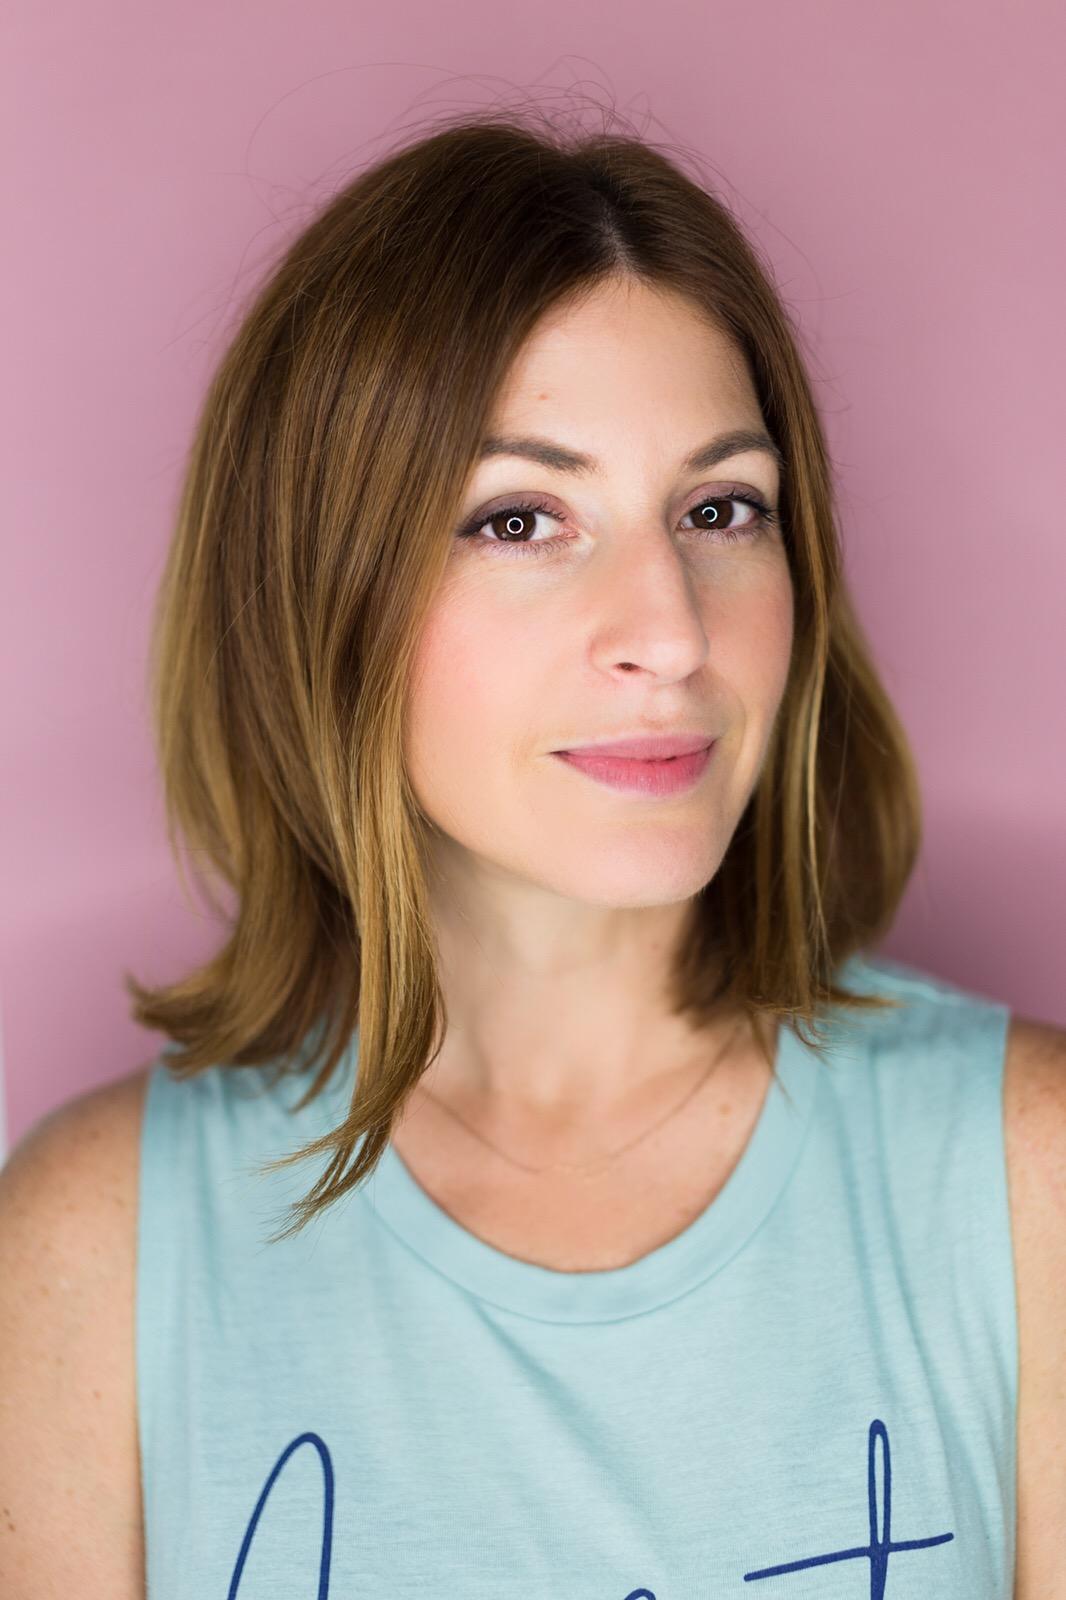 Tiffany Napper Green Hair Care